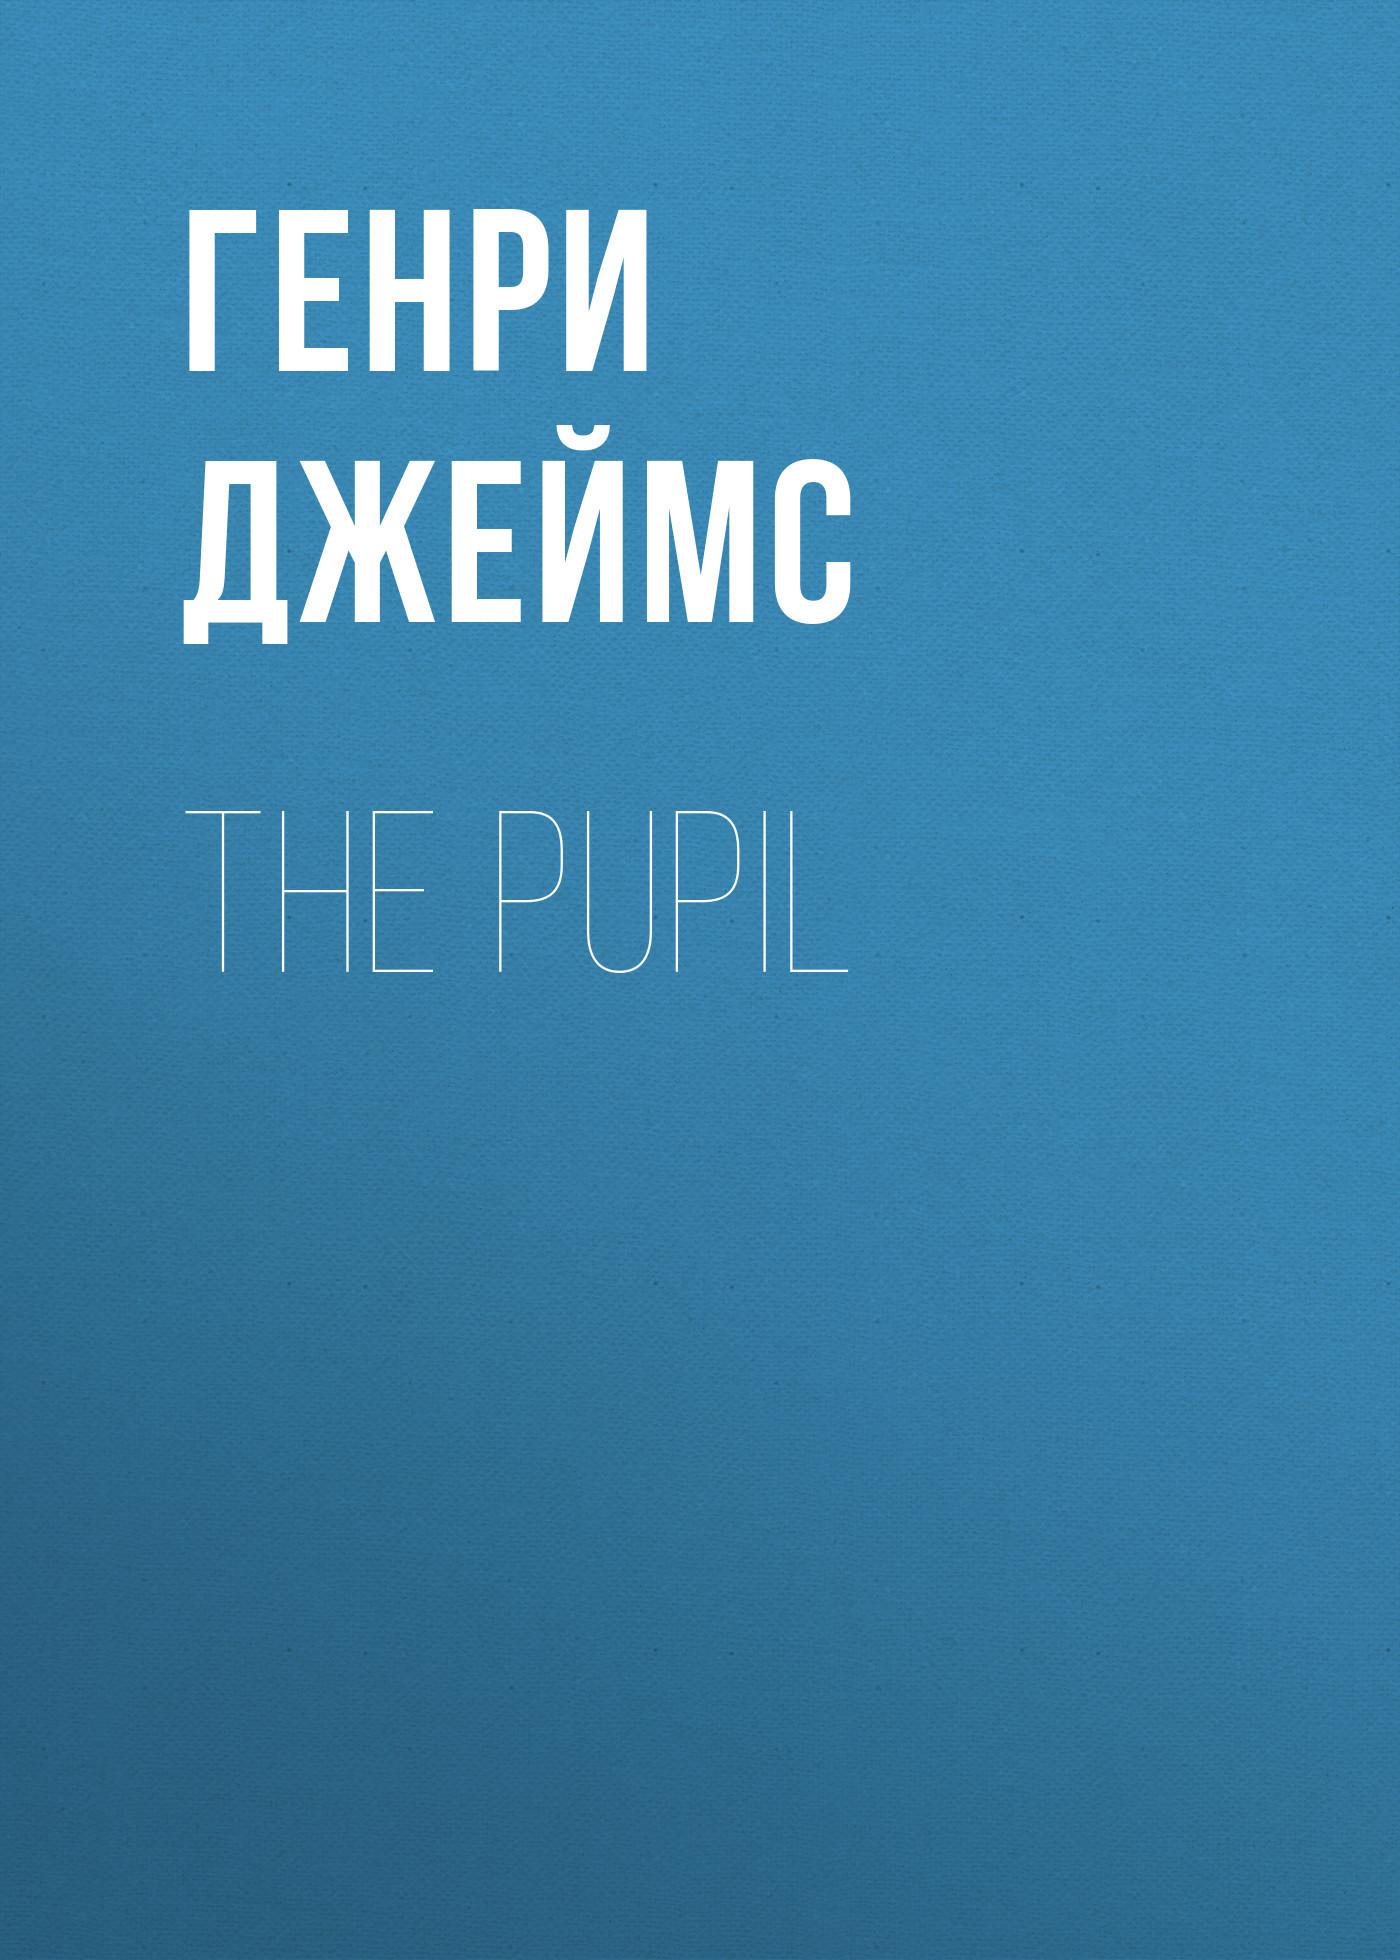 Генри Джеймс The Pupil